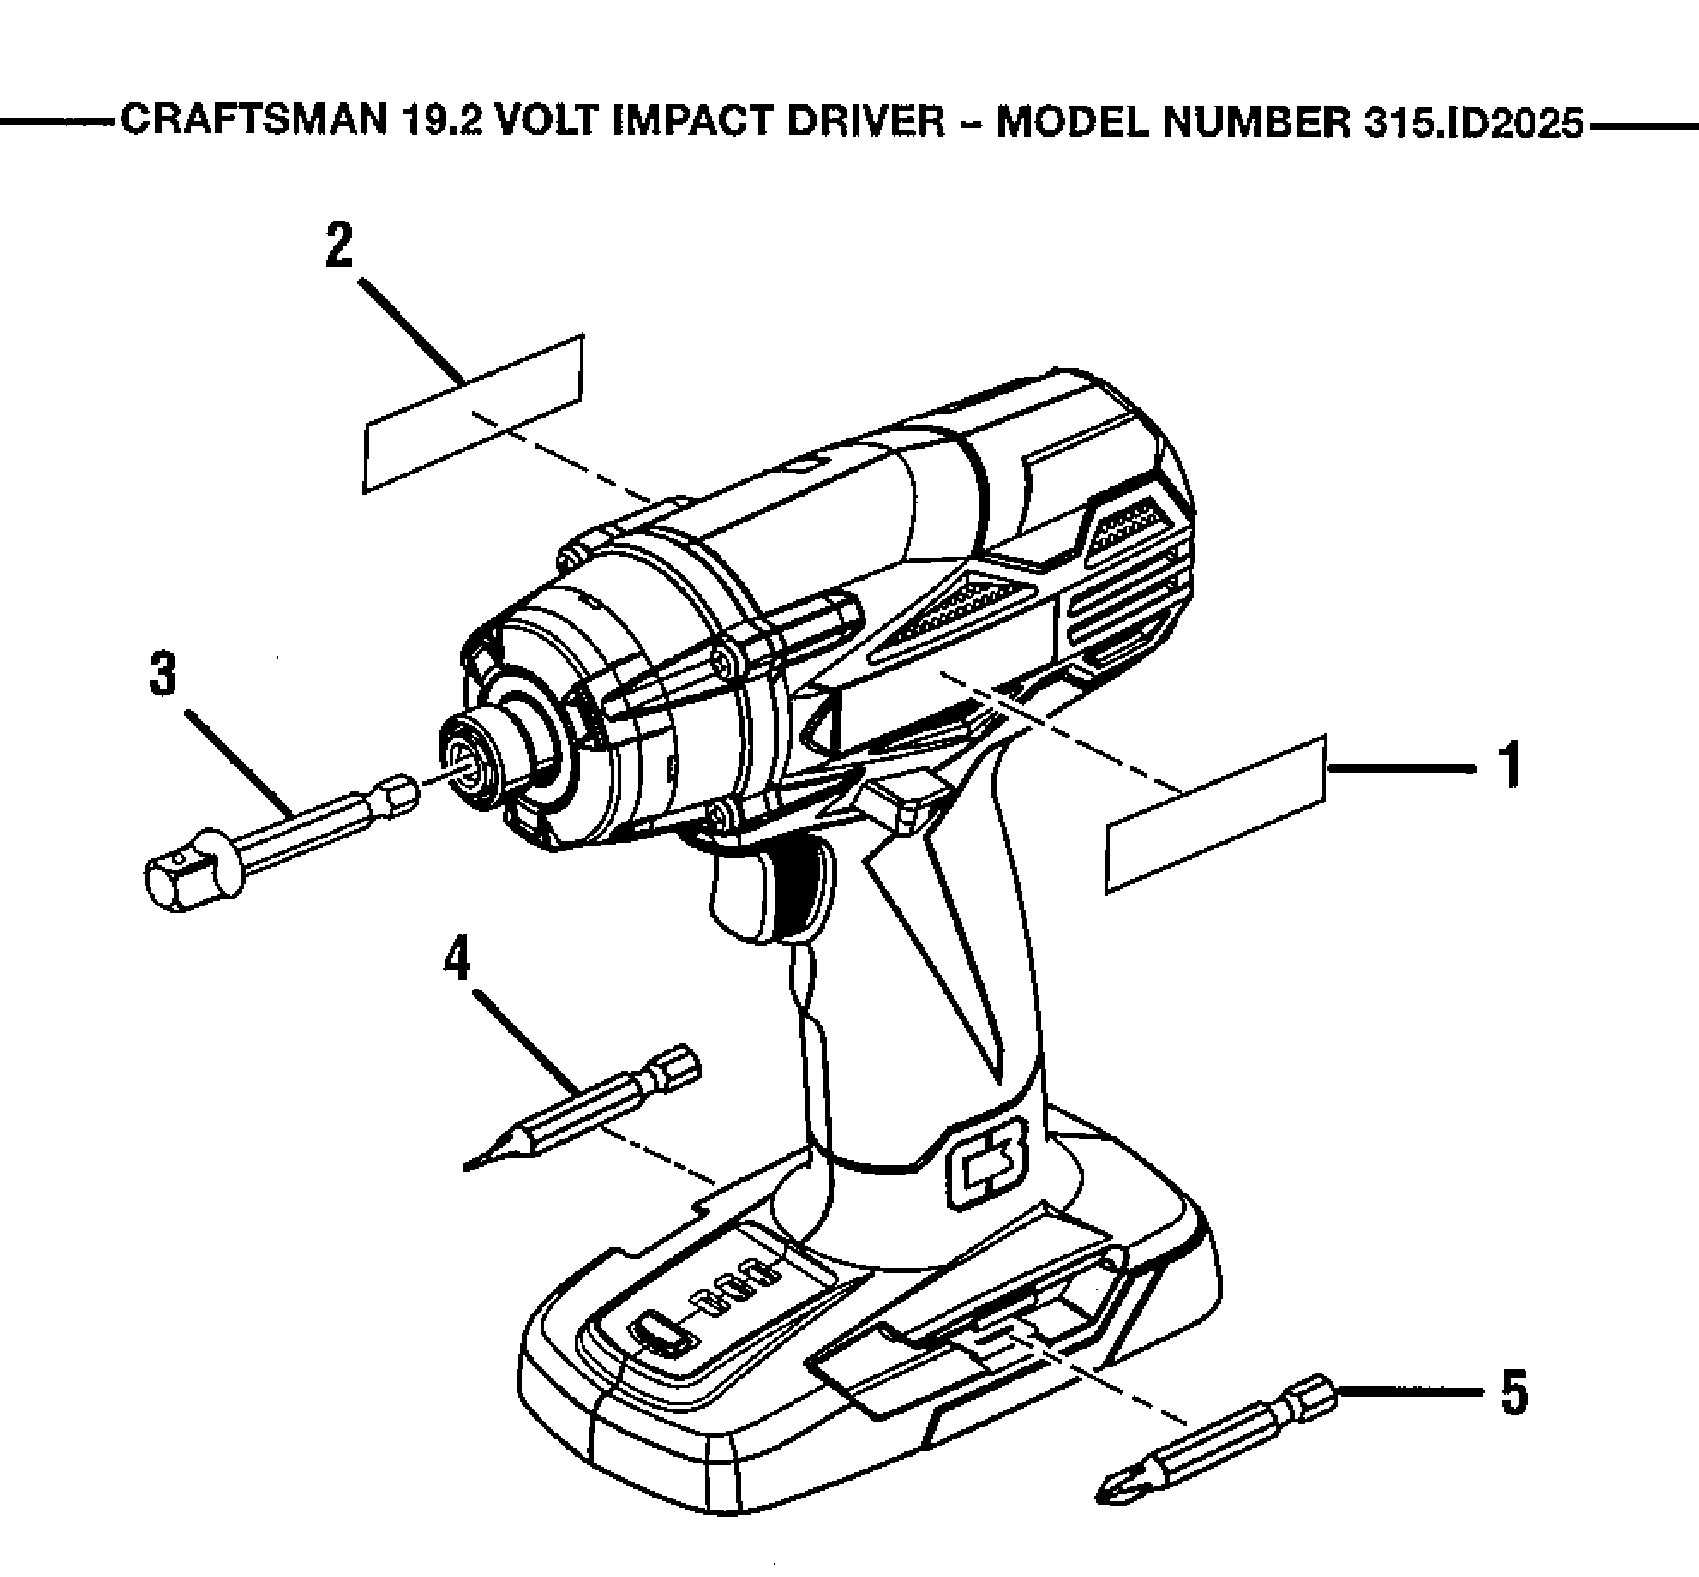 Craftsman model 315ID2025 impact tool genuine parts